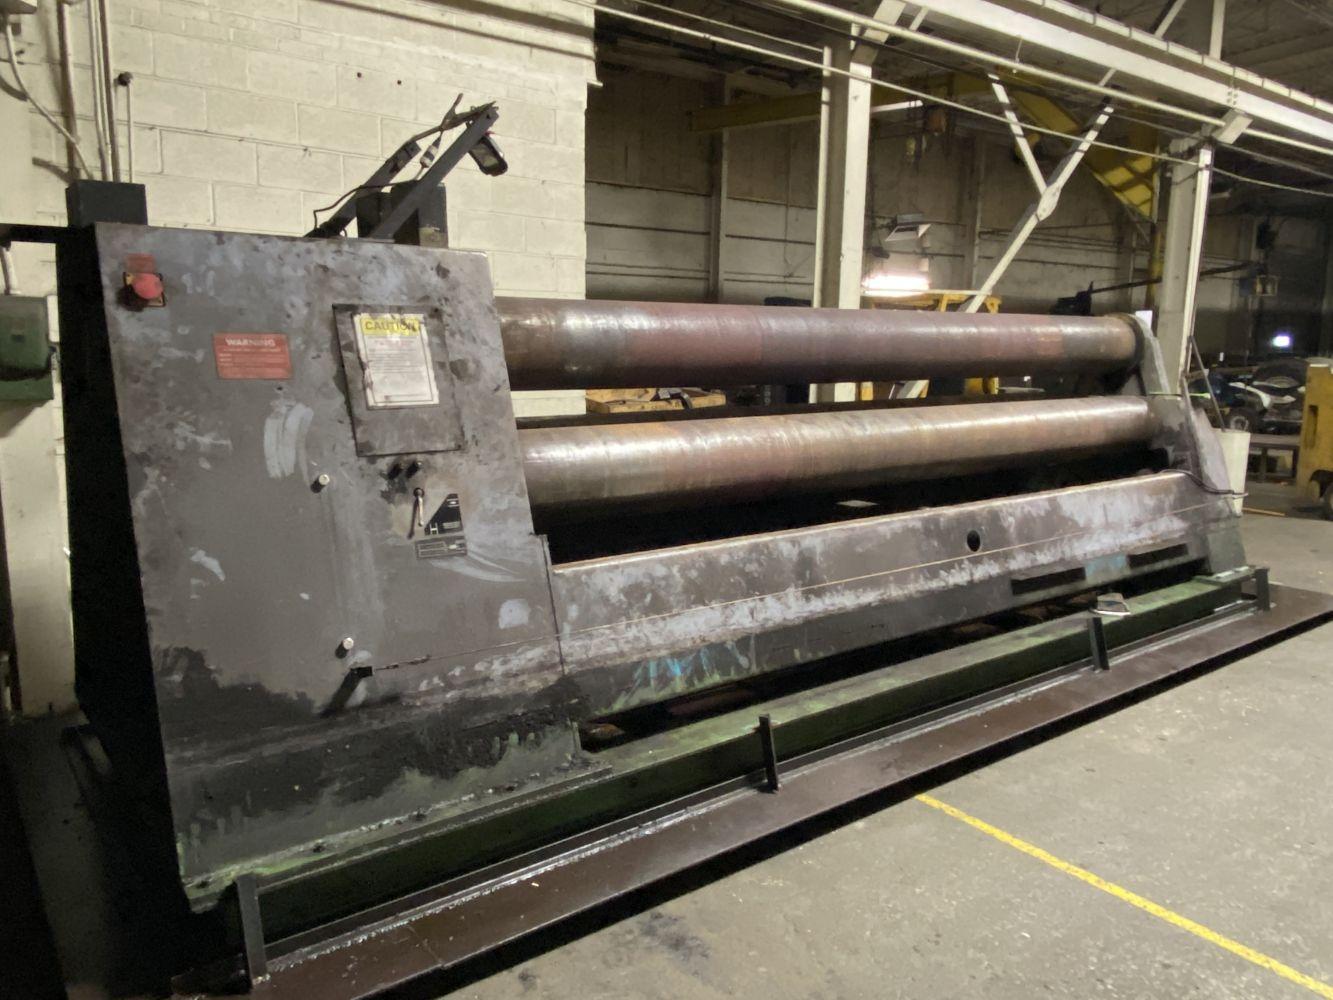 Welding & Metalworking Equipment (TRM Manufacturing, Inc.)